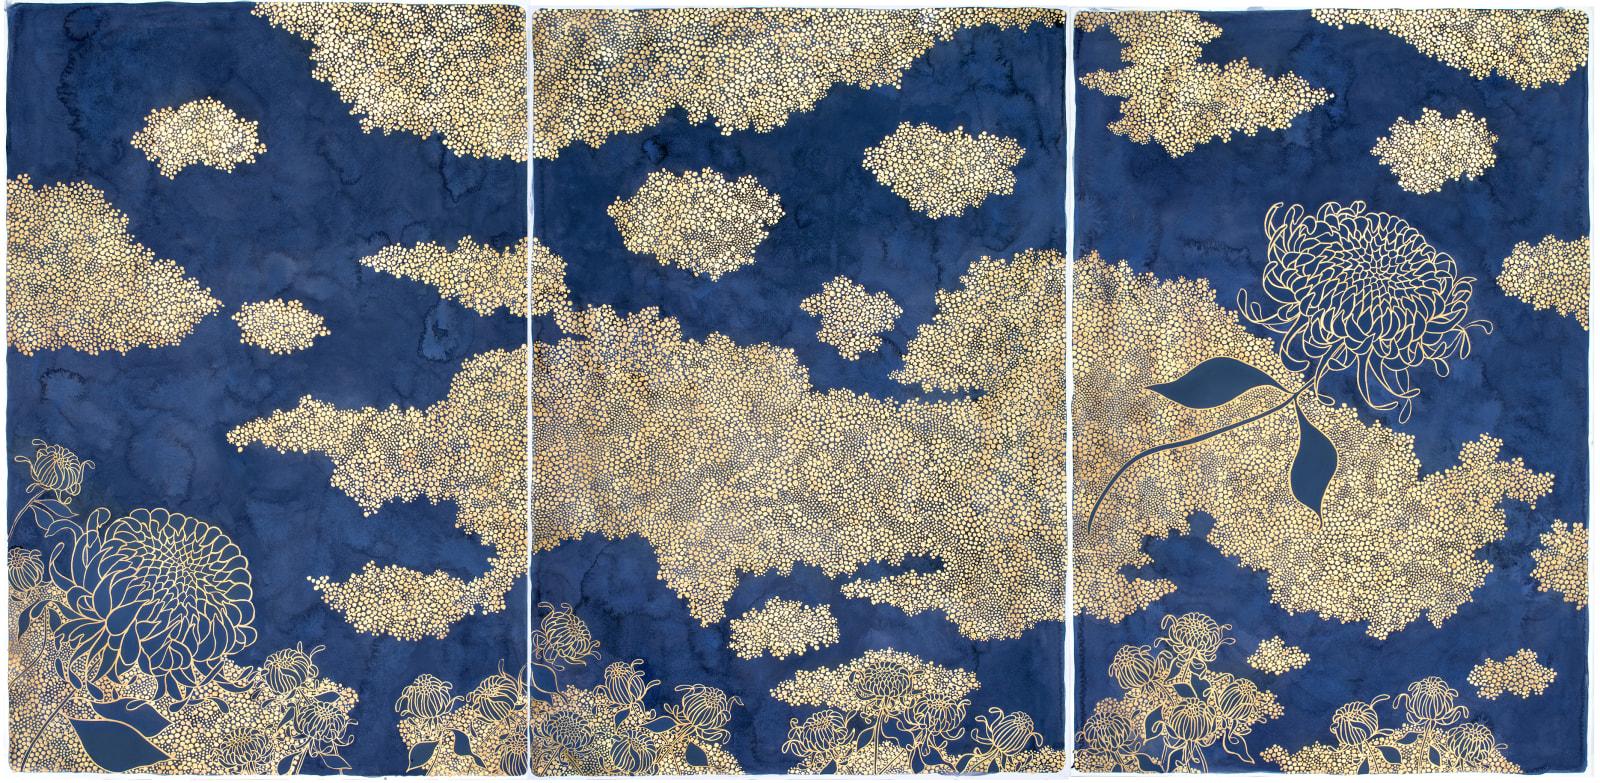 Crystal Liu, the lake, 'can you see me', 2016